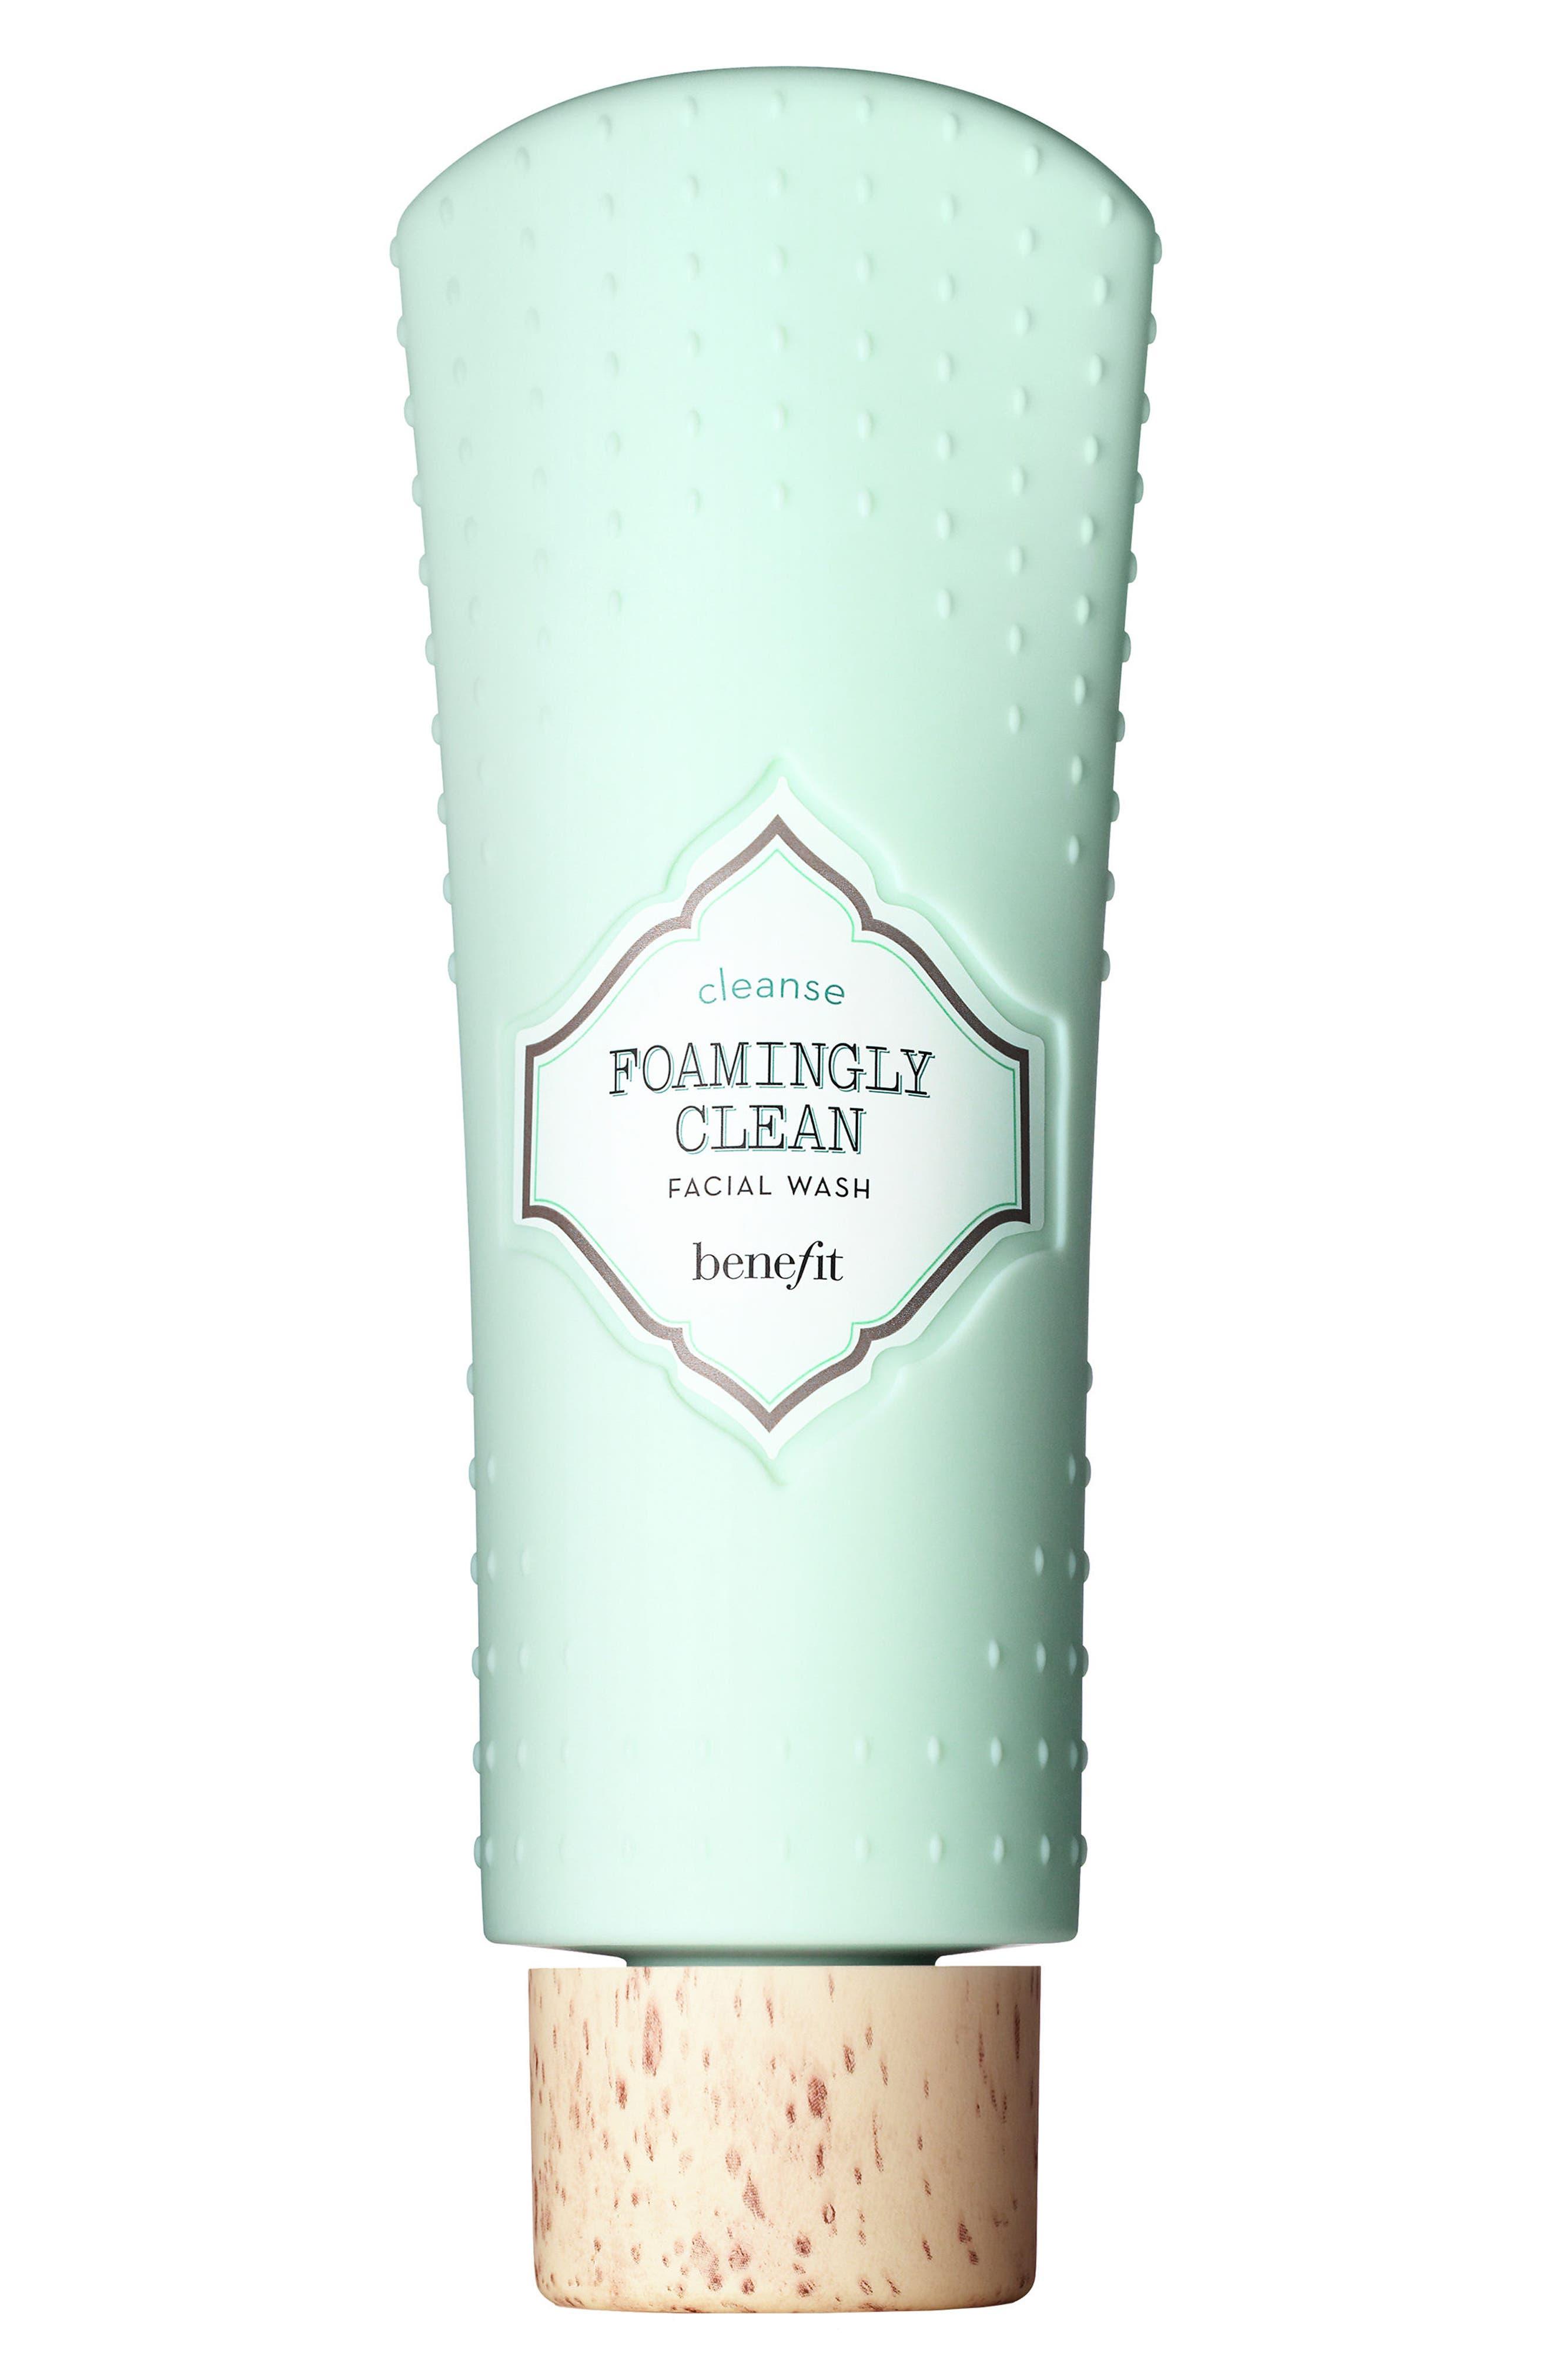 Benefit Foamingly Clean Facial Wash,                             Main thumbnail 1, color,                             No Color